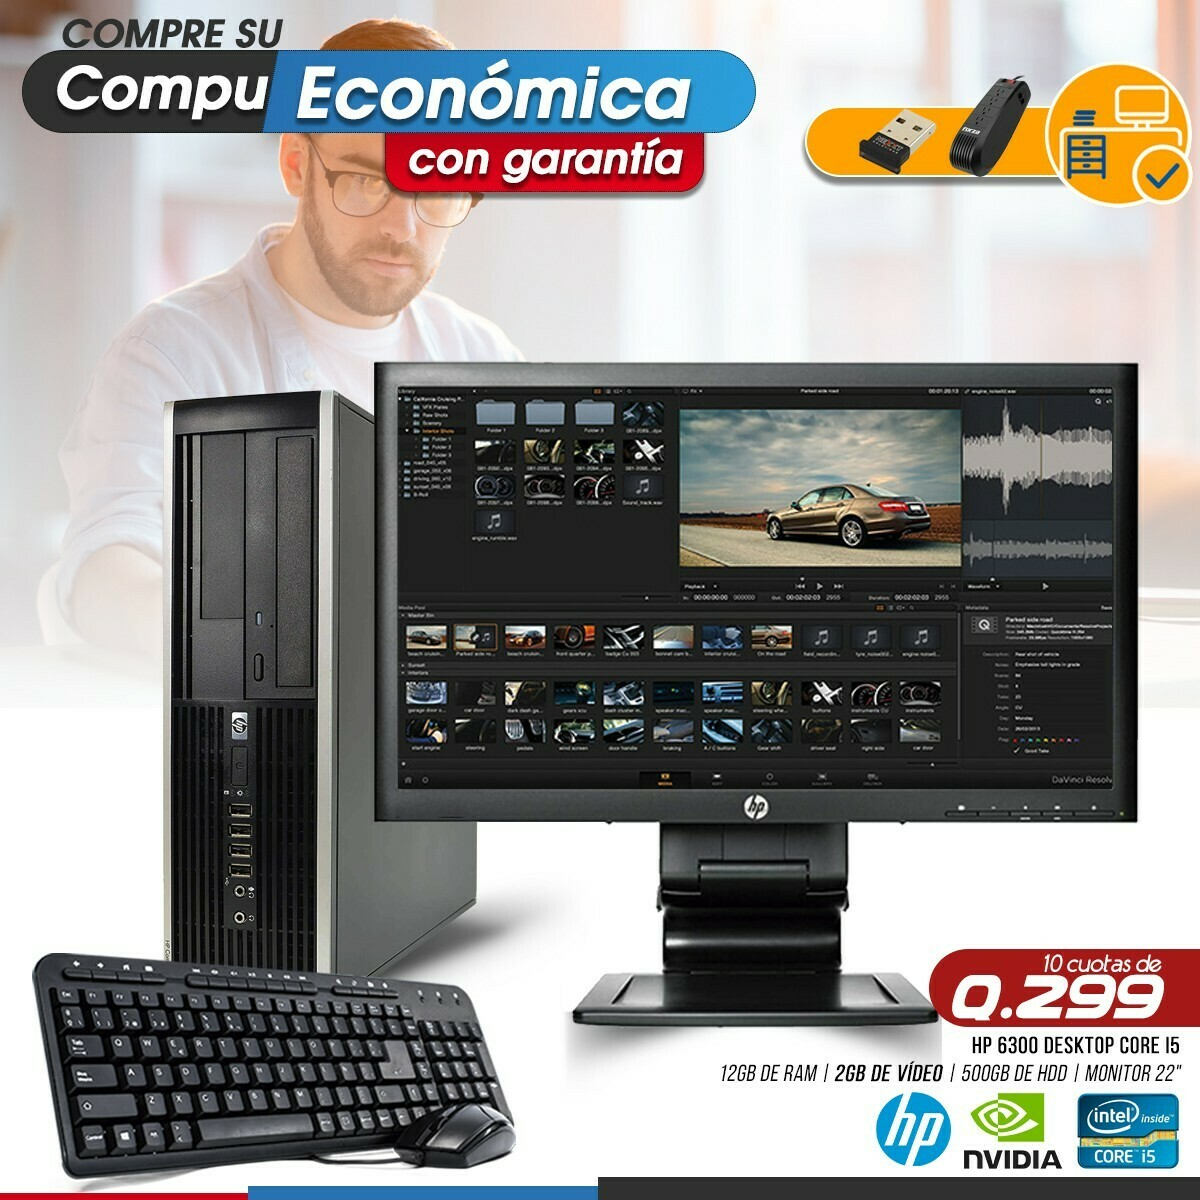 HP Elite Pro 6300 Core i5 Desktop